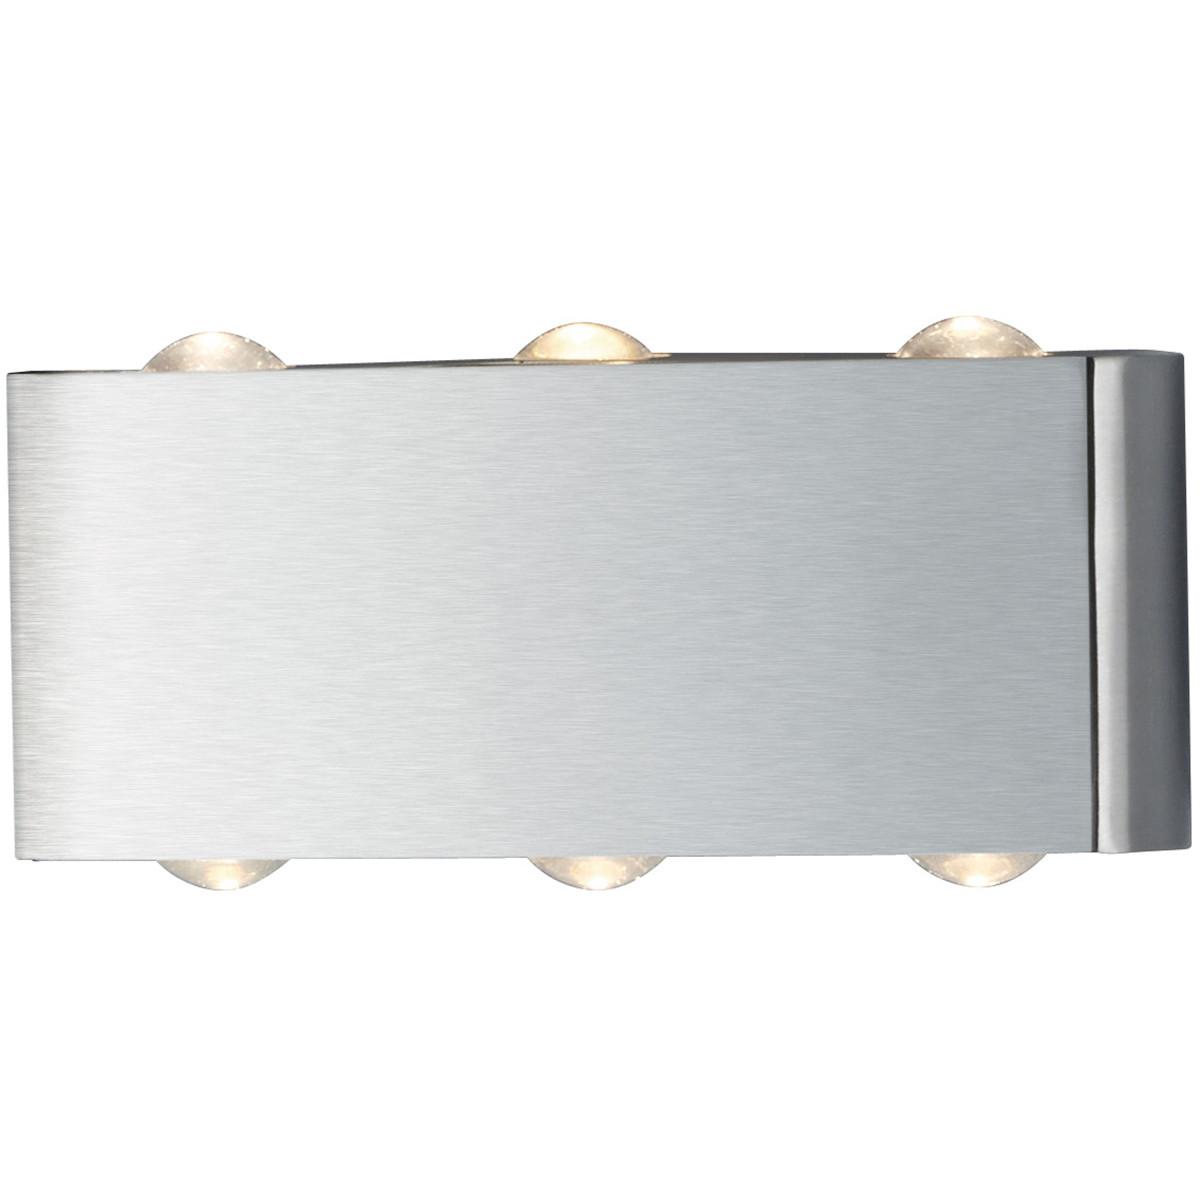 OSRAM - LED Wandlamp - Trion Abironidan - 6W - Warm Wit 3000K - 6-lichts - Rechthoek - Mat Nikkel -